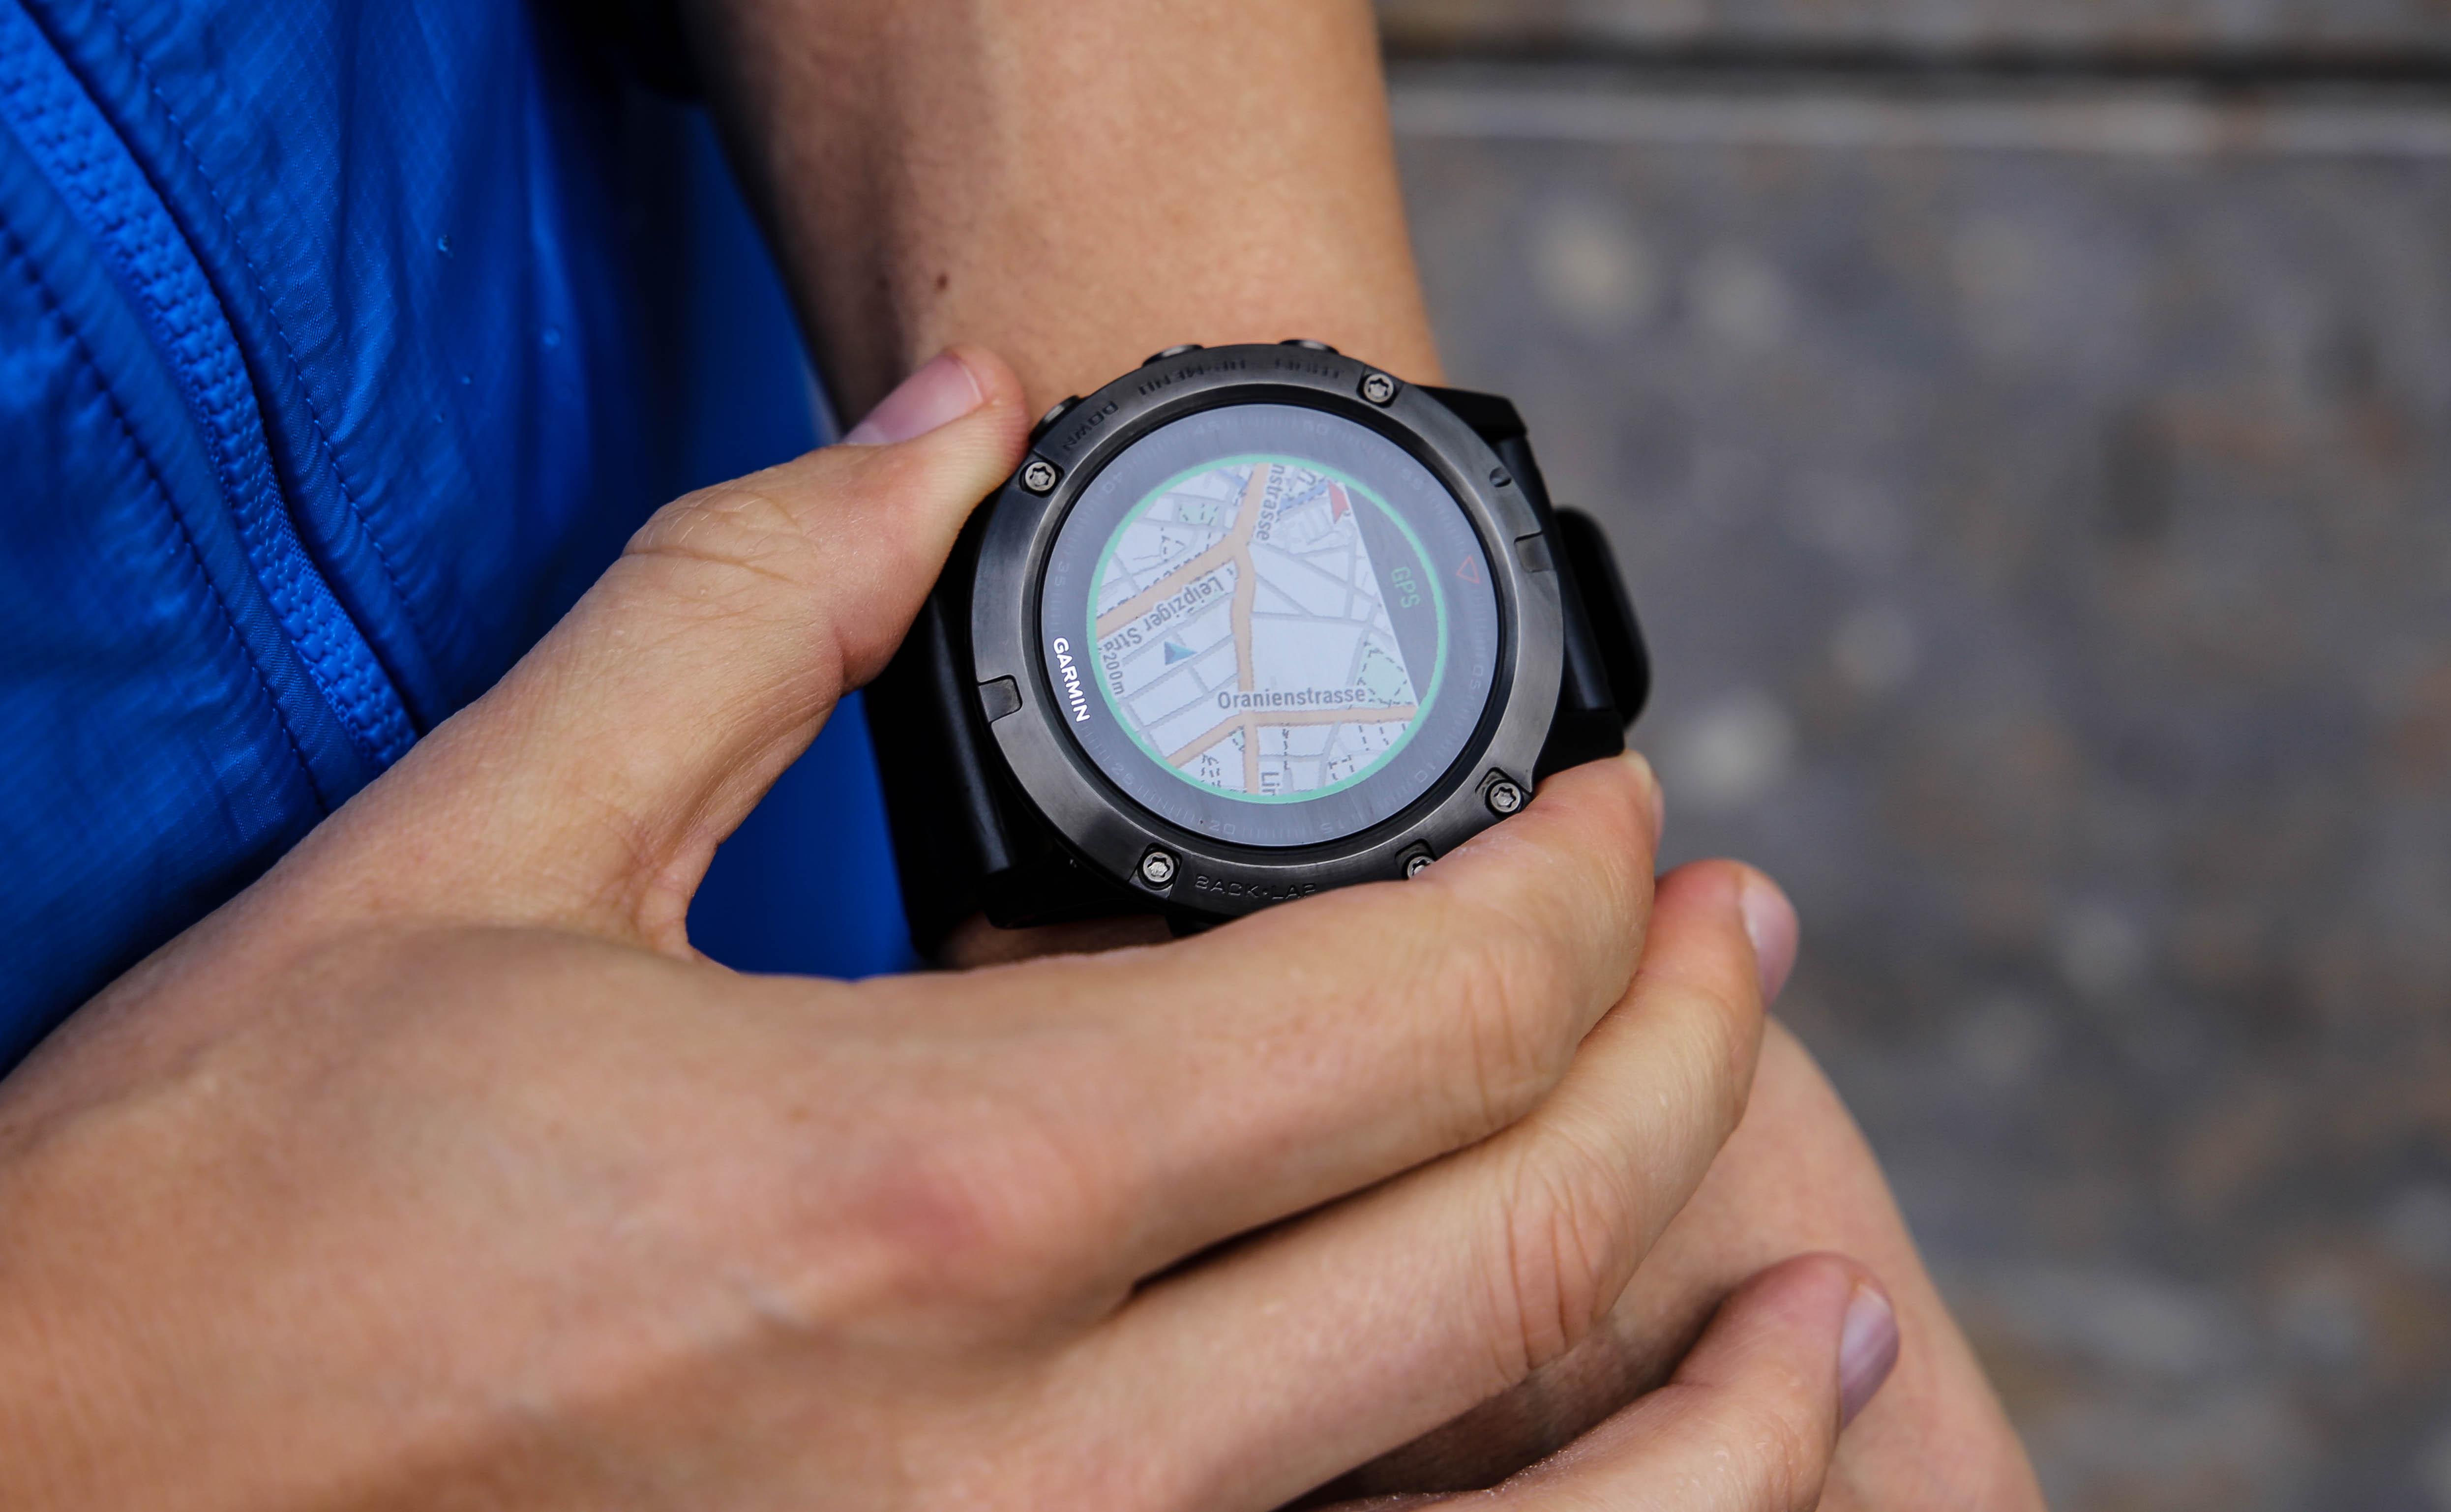 multisport-uhr-garmin-fenix-5x-sportuhr-fitness-tracker-sport-fitness-blogger_0380